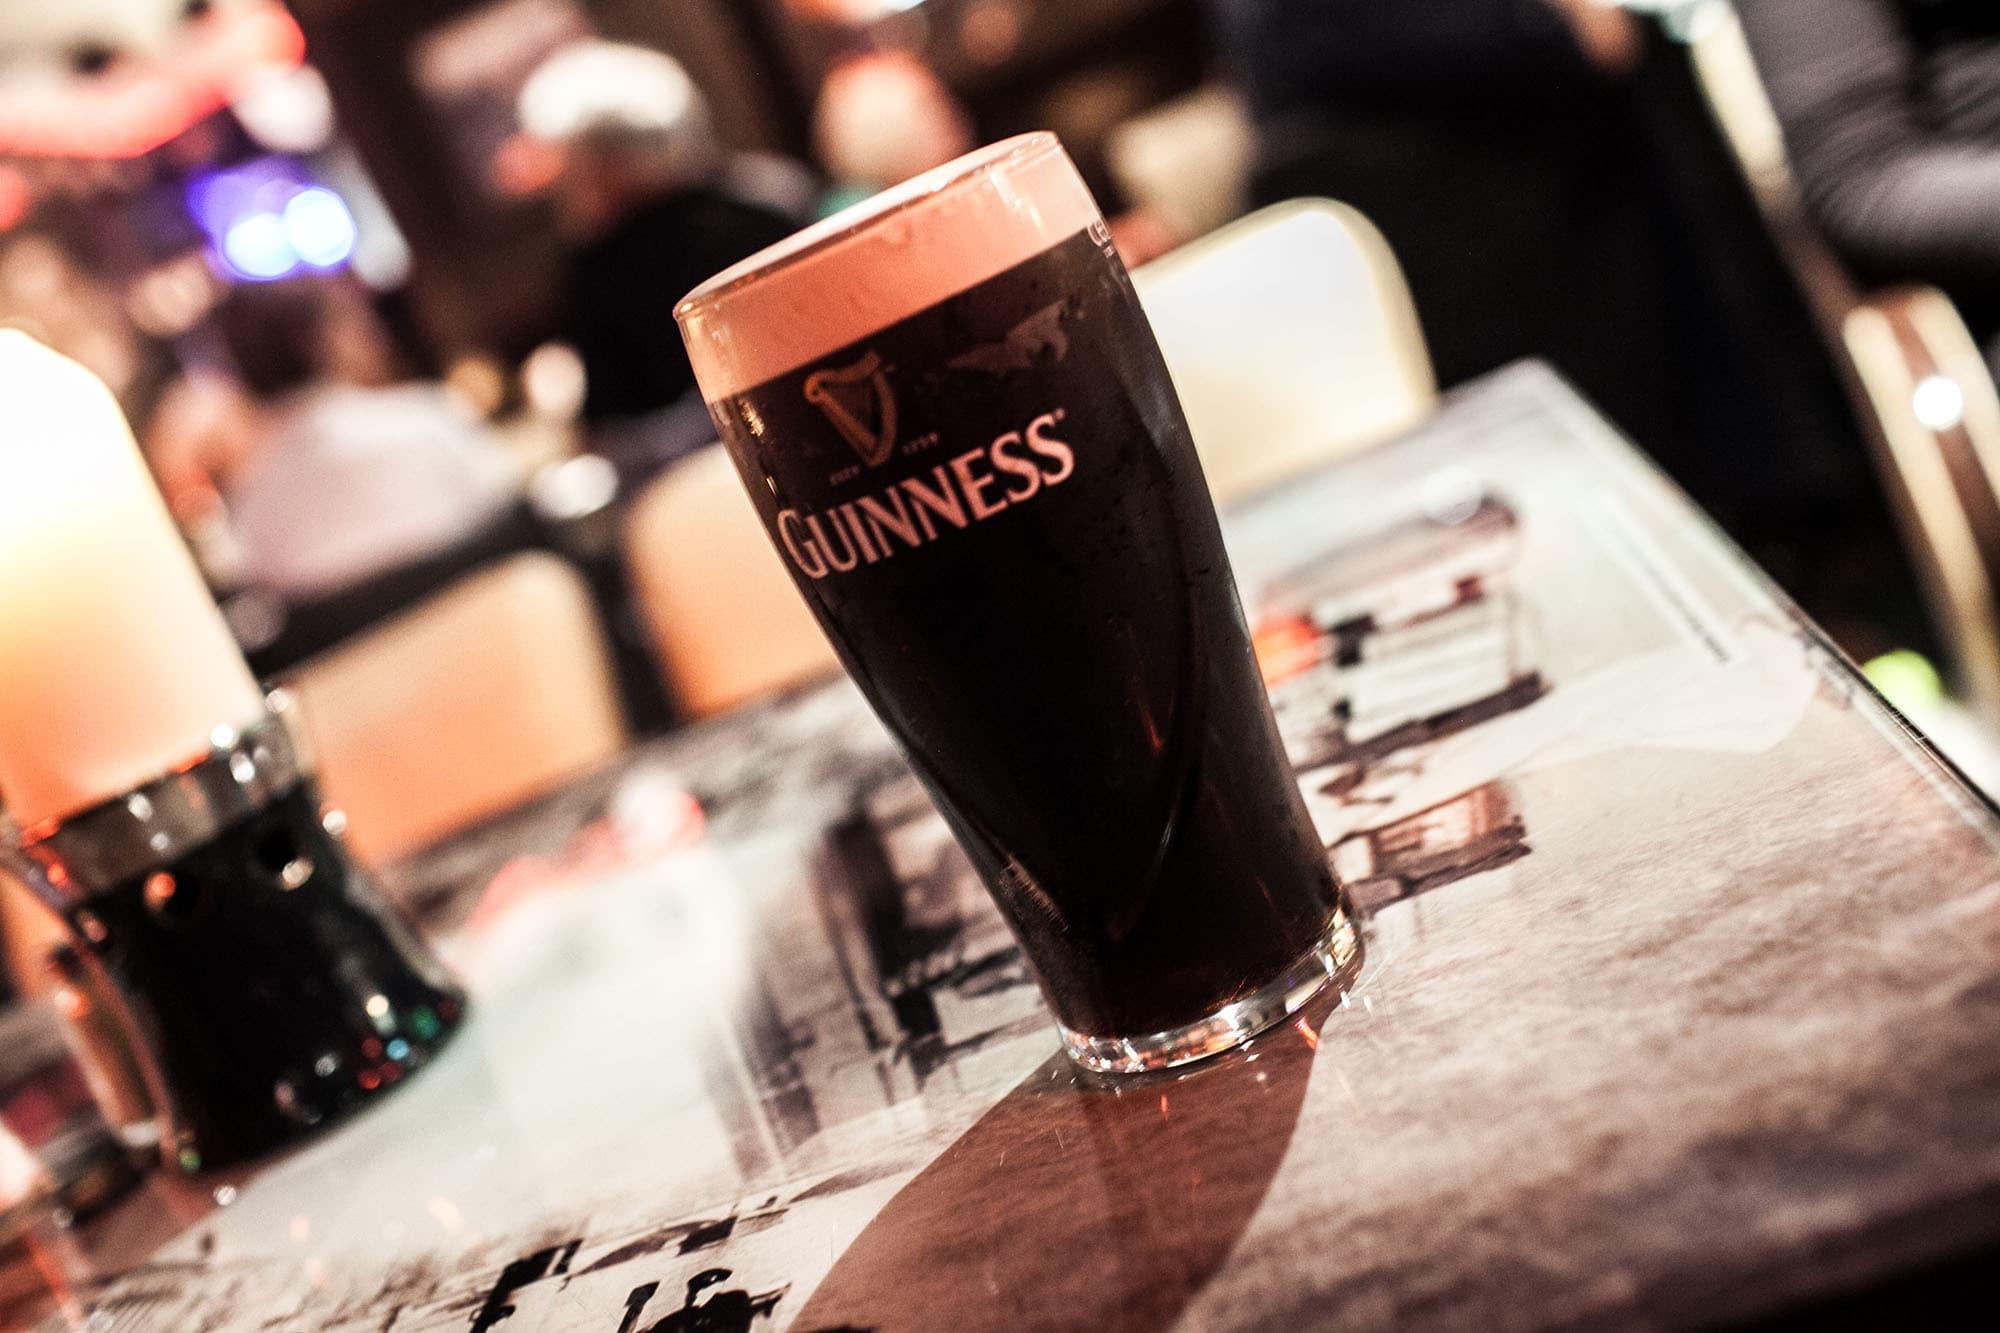 Guinness in an Irish Pub - Dublin, Ireland